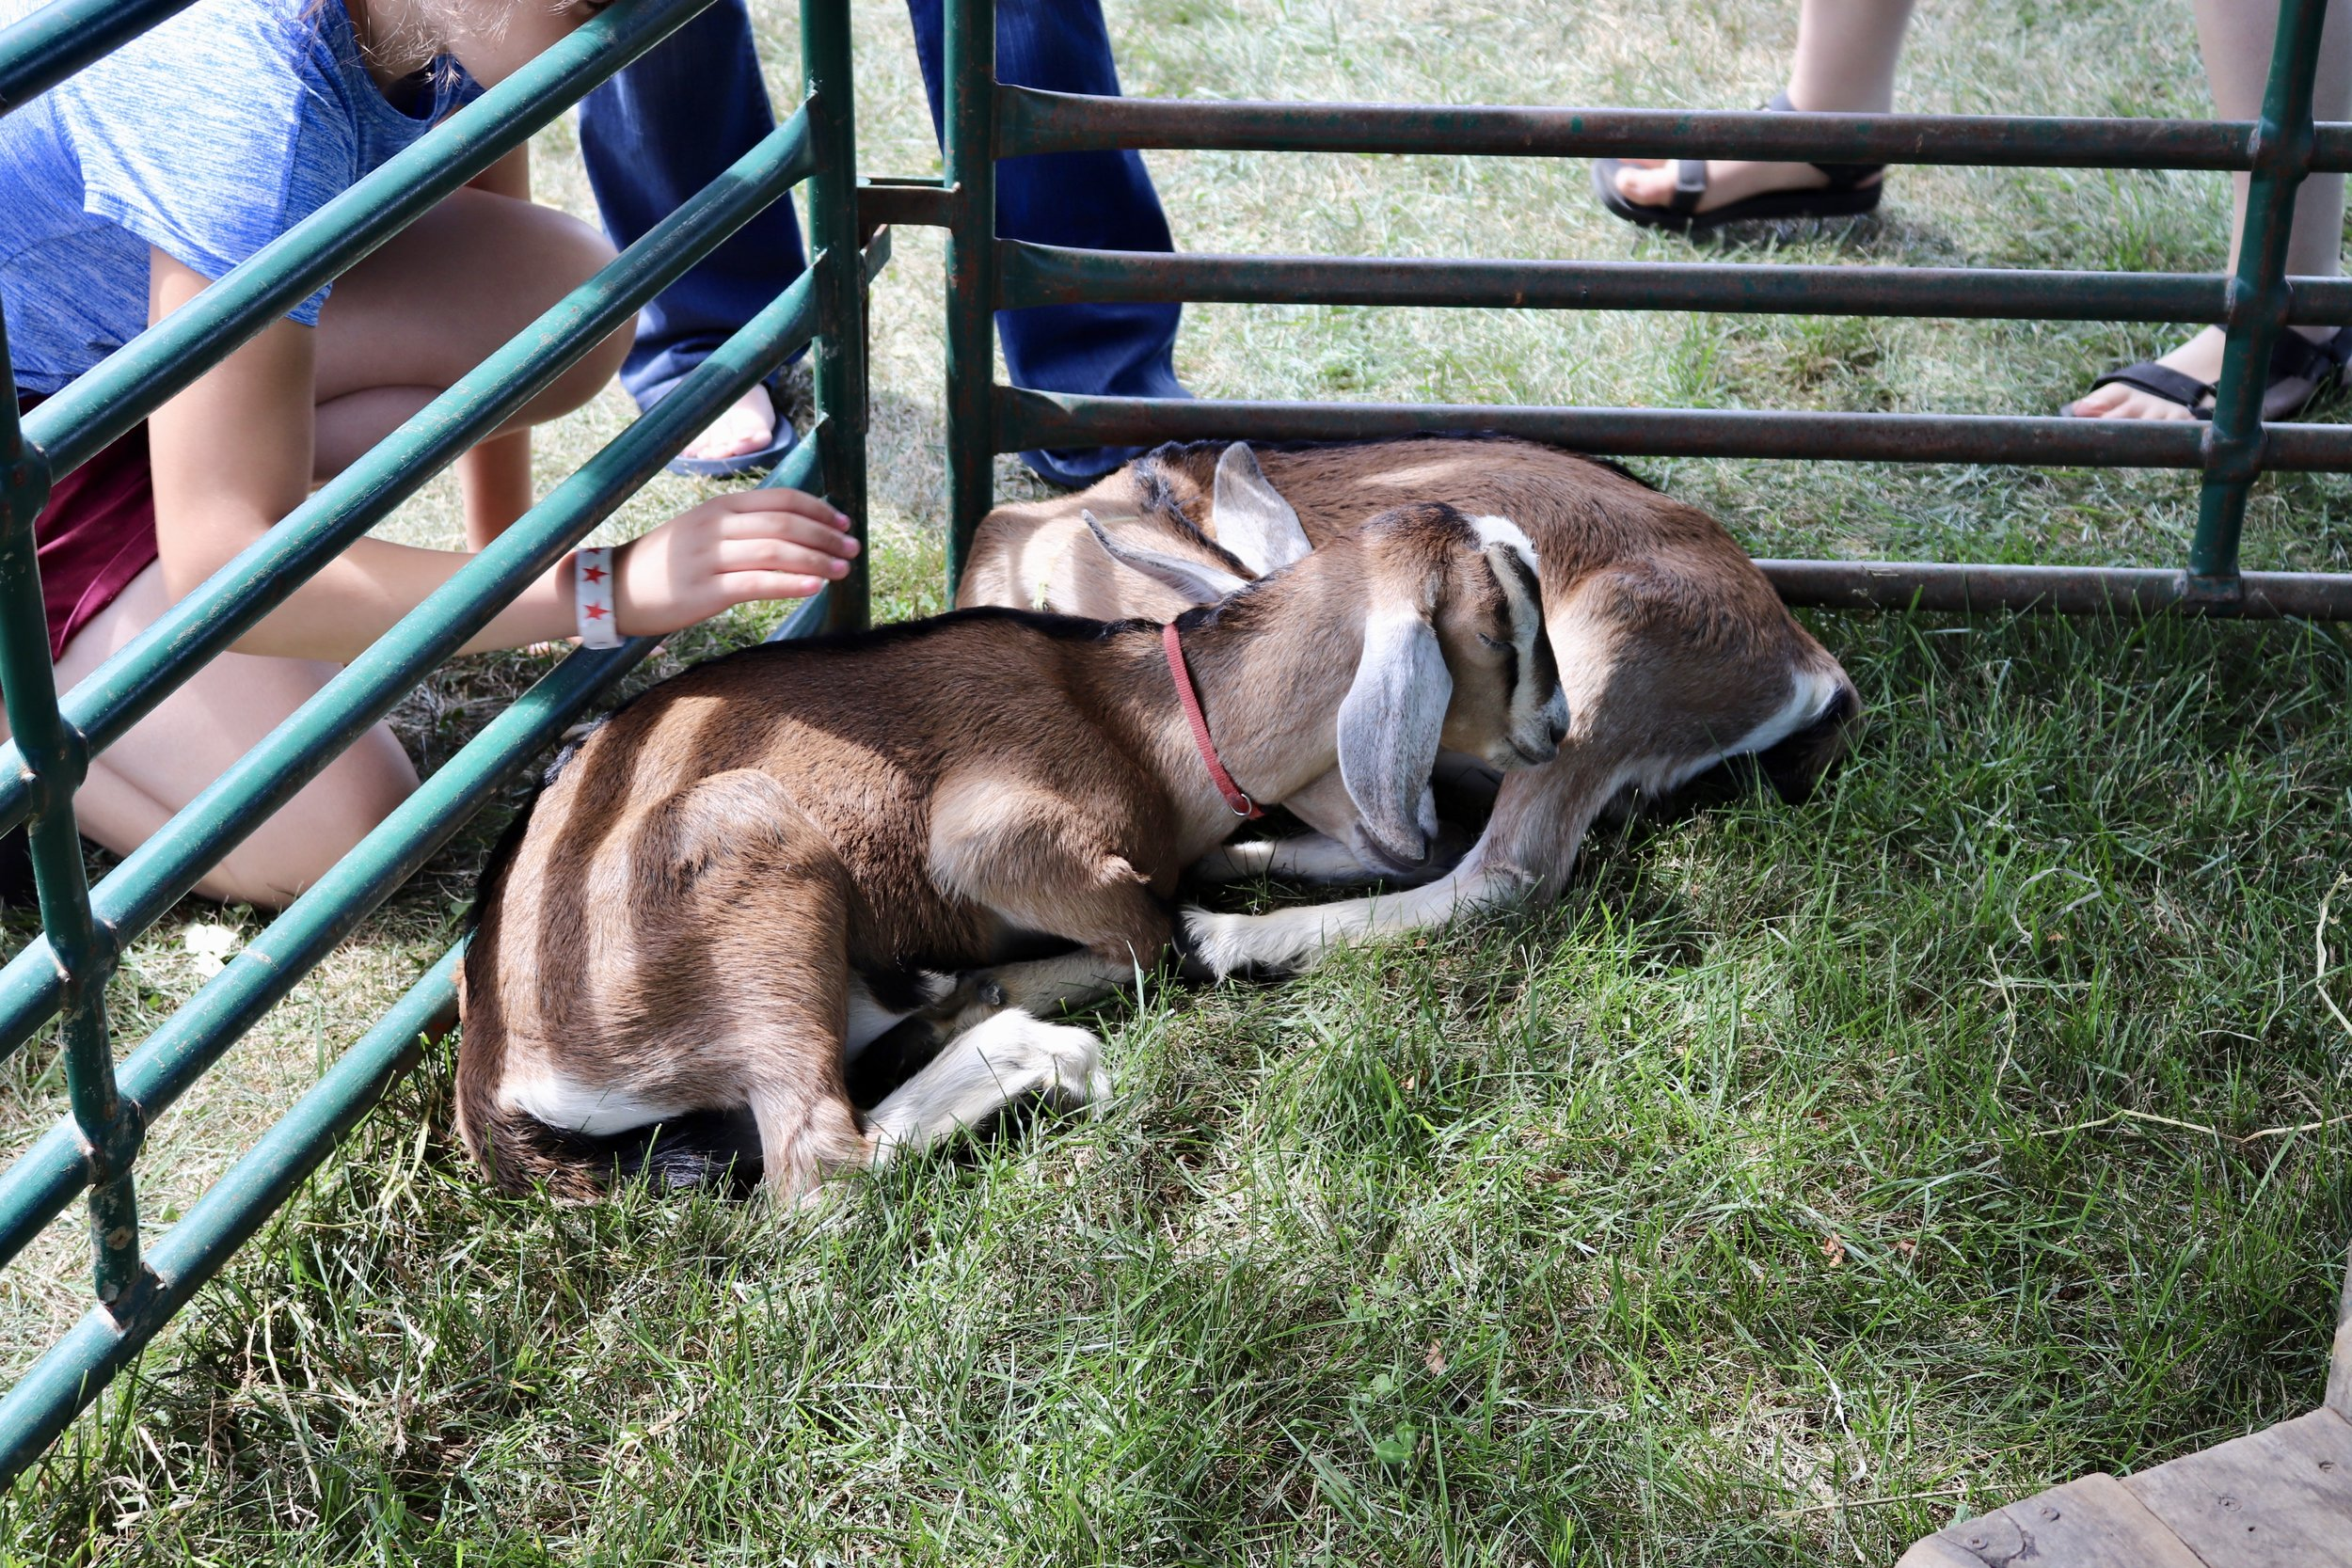 baby goat loves the naps